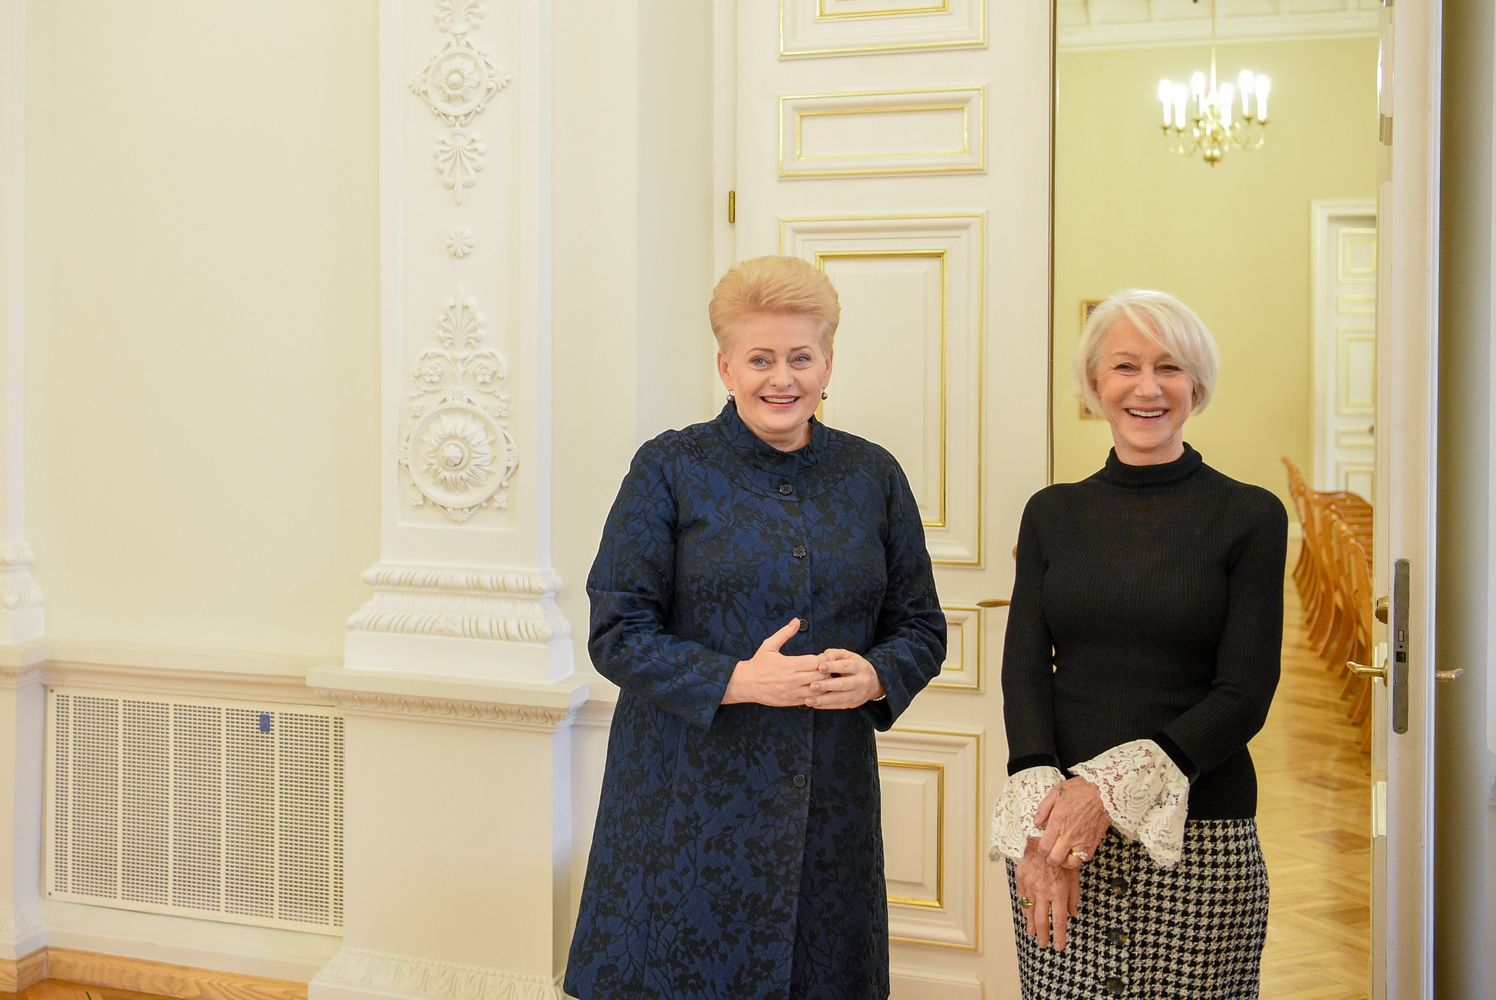 D. Grybauskaitė prezidentūroje priėmė aktorę H. Mirren